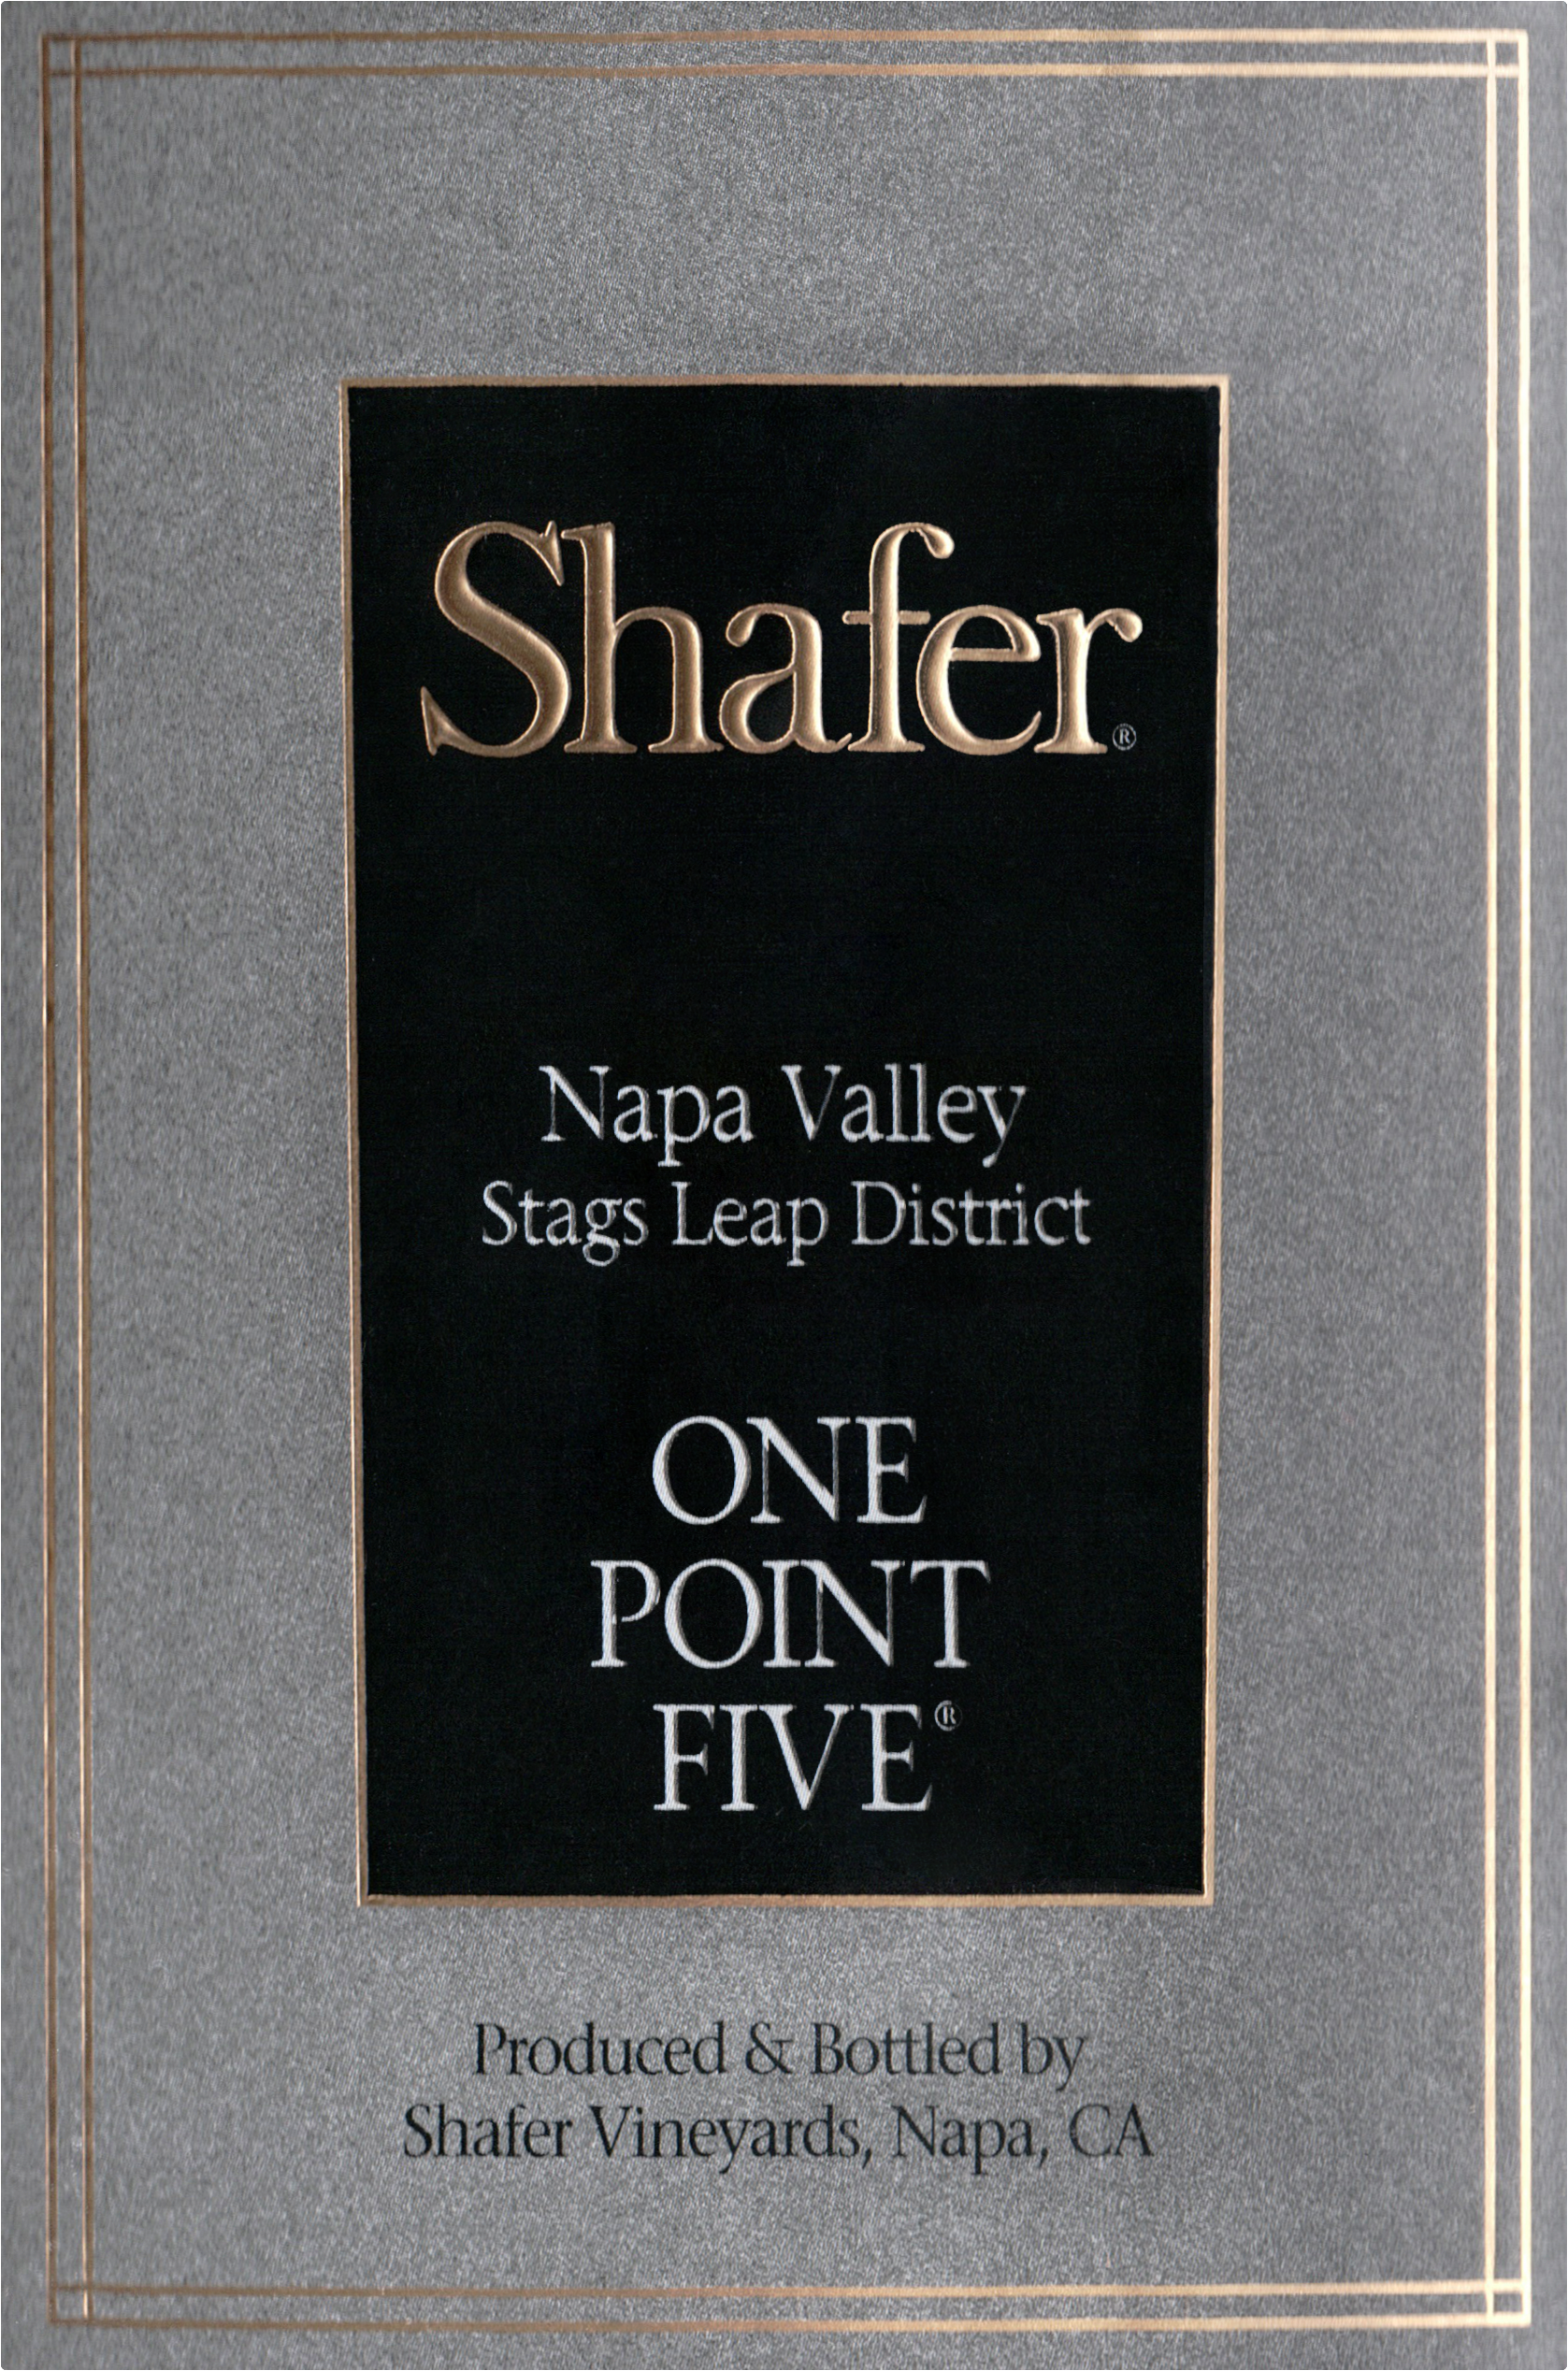 Shafer Cabernet Sauvignon One Point Five 2017